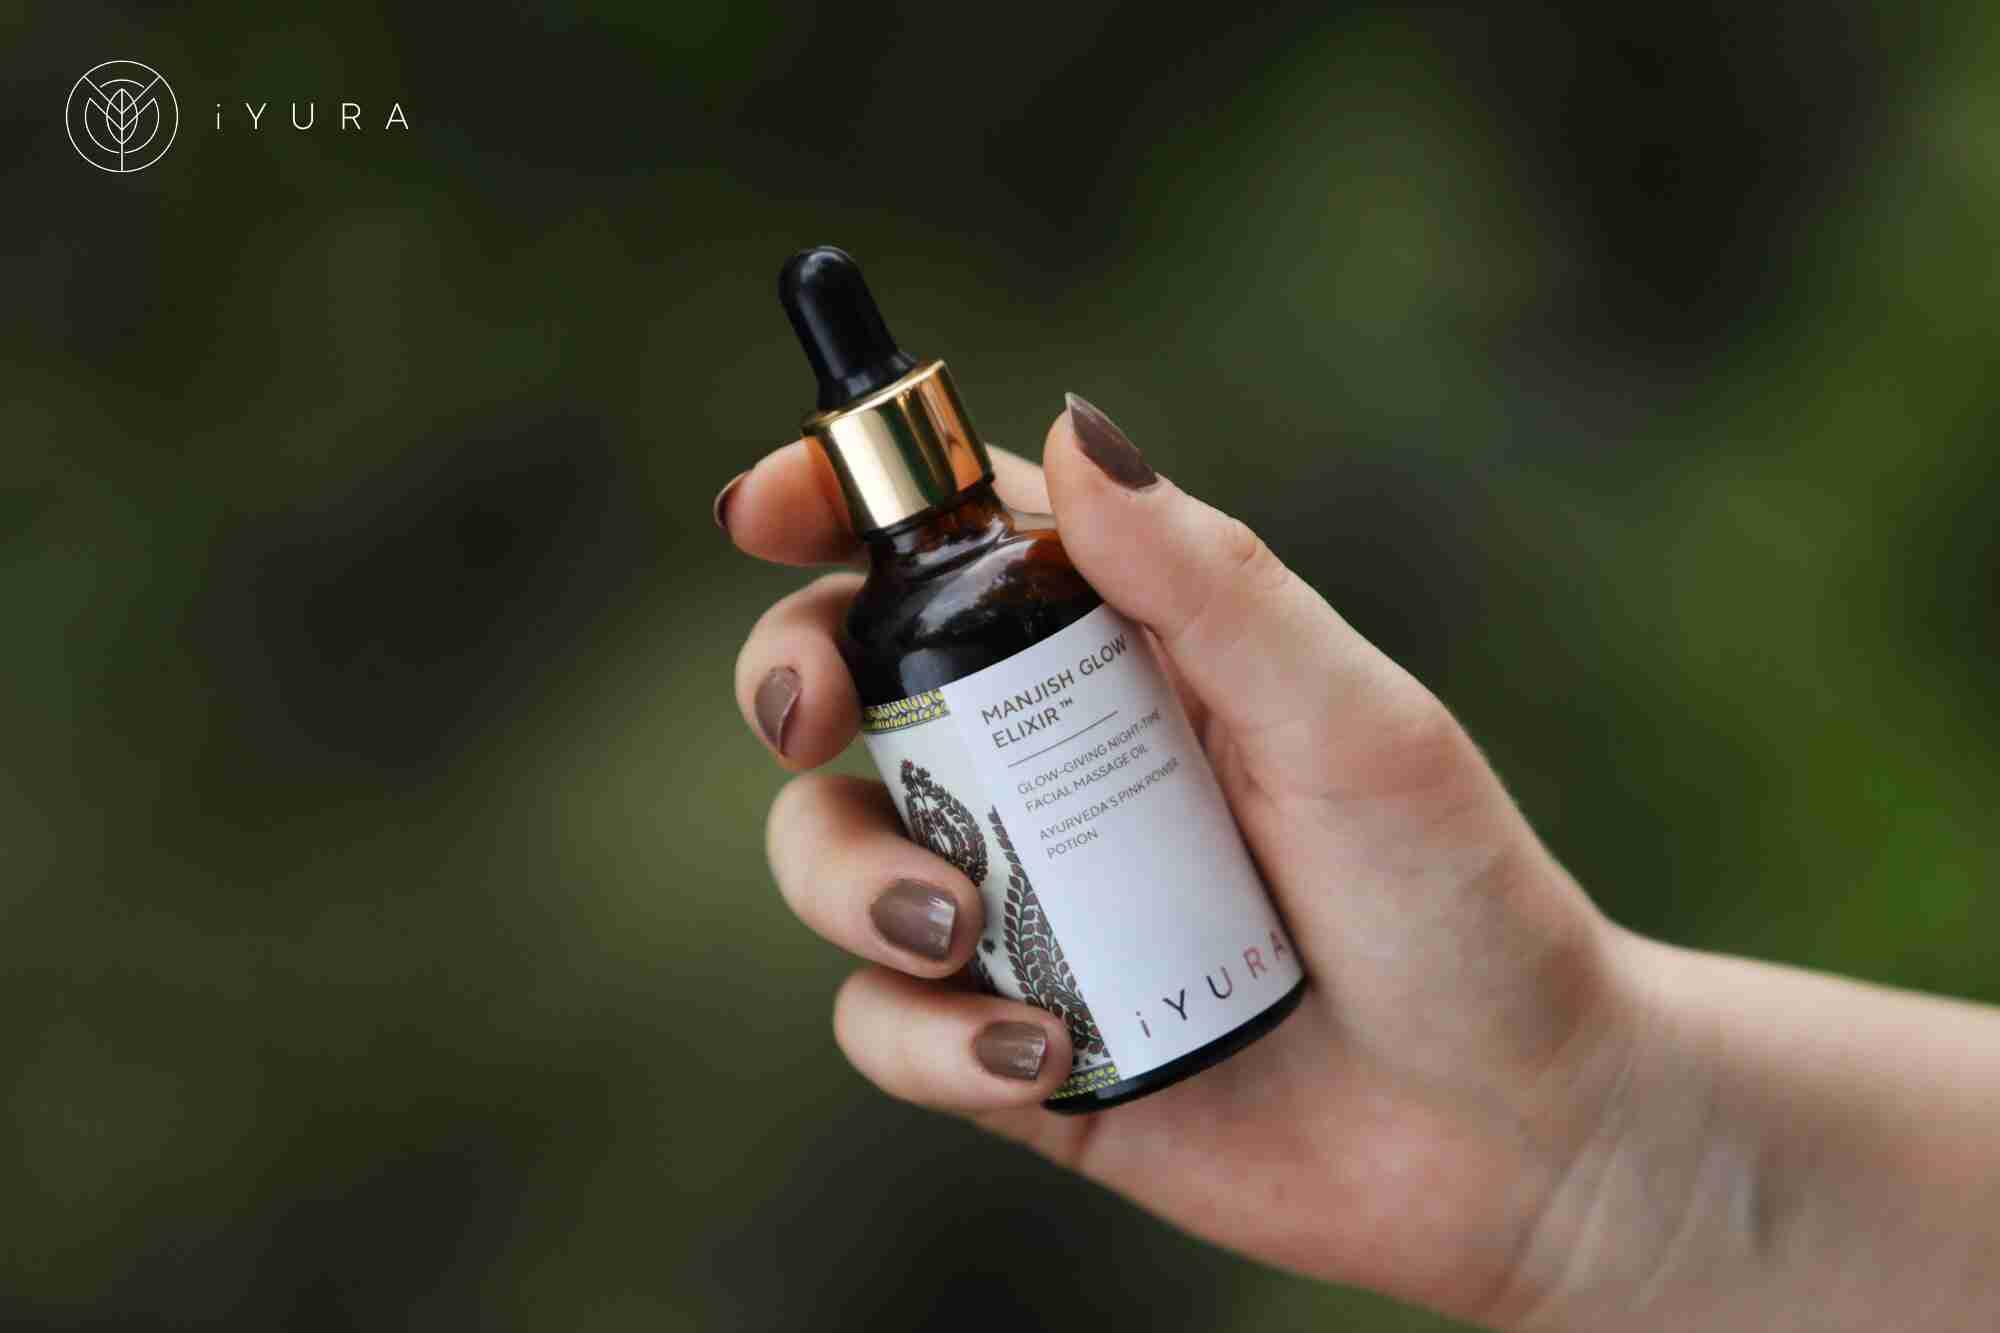 iYURA Manjish Glow Elixir - 4 drops, 5 minutes every night for a natural, no makeup glow!